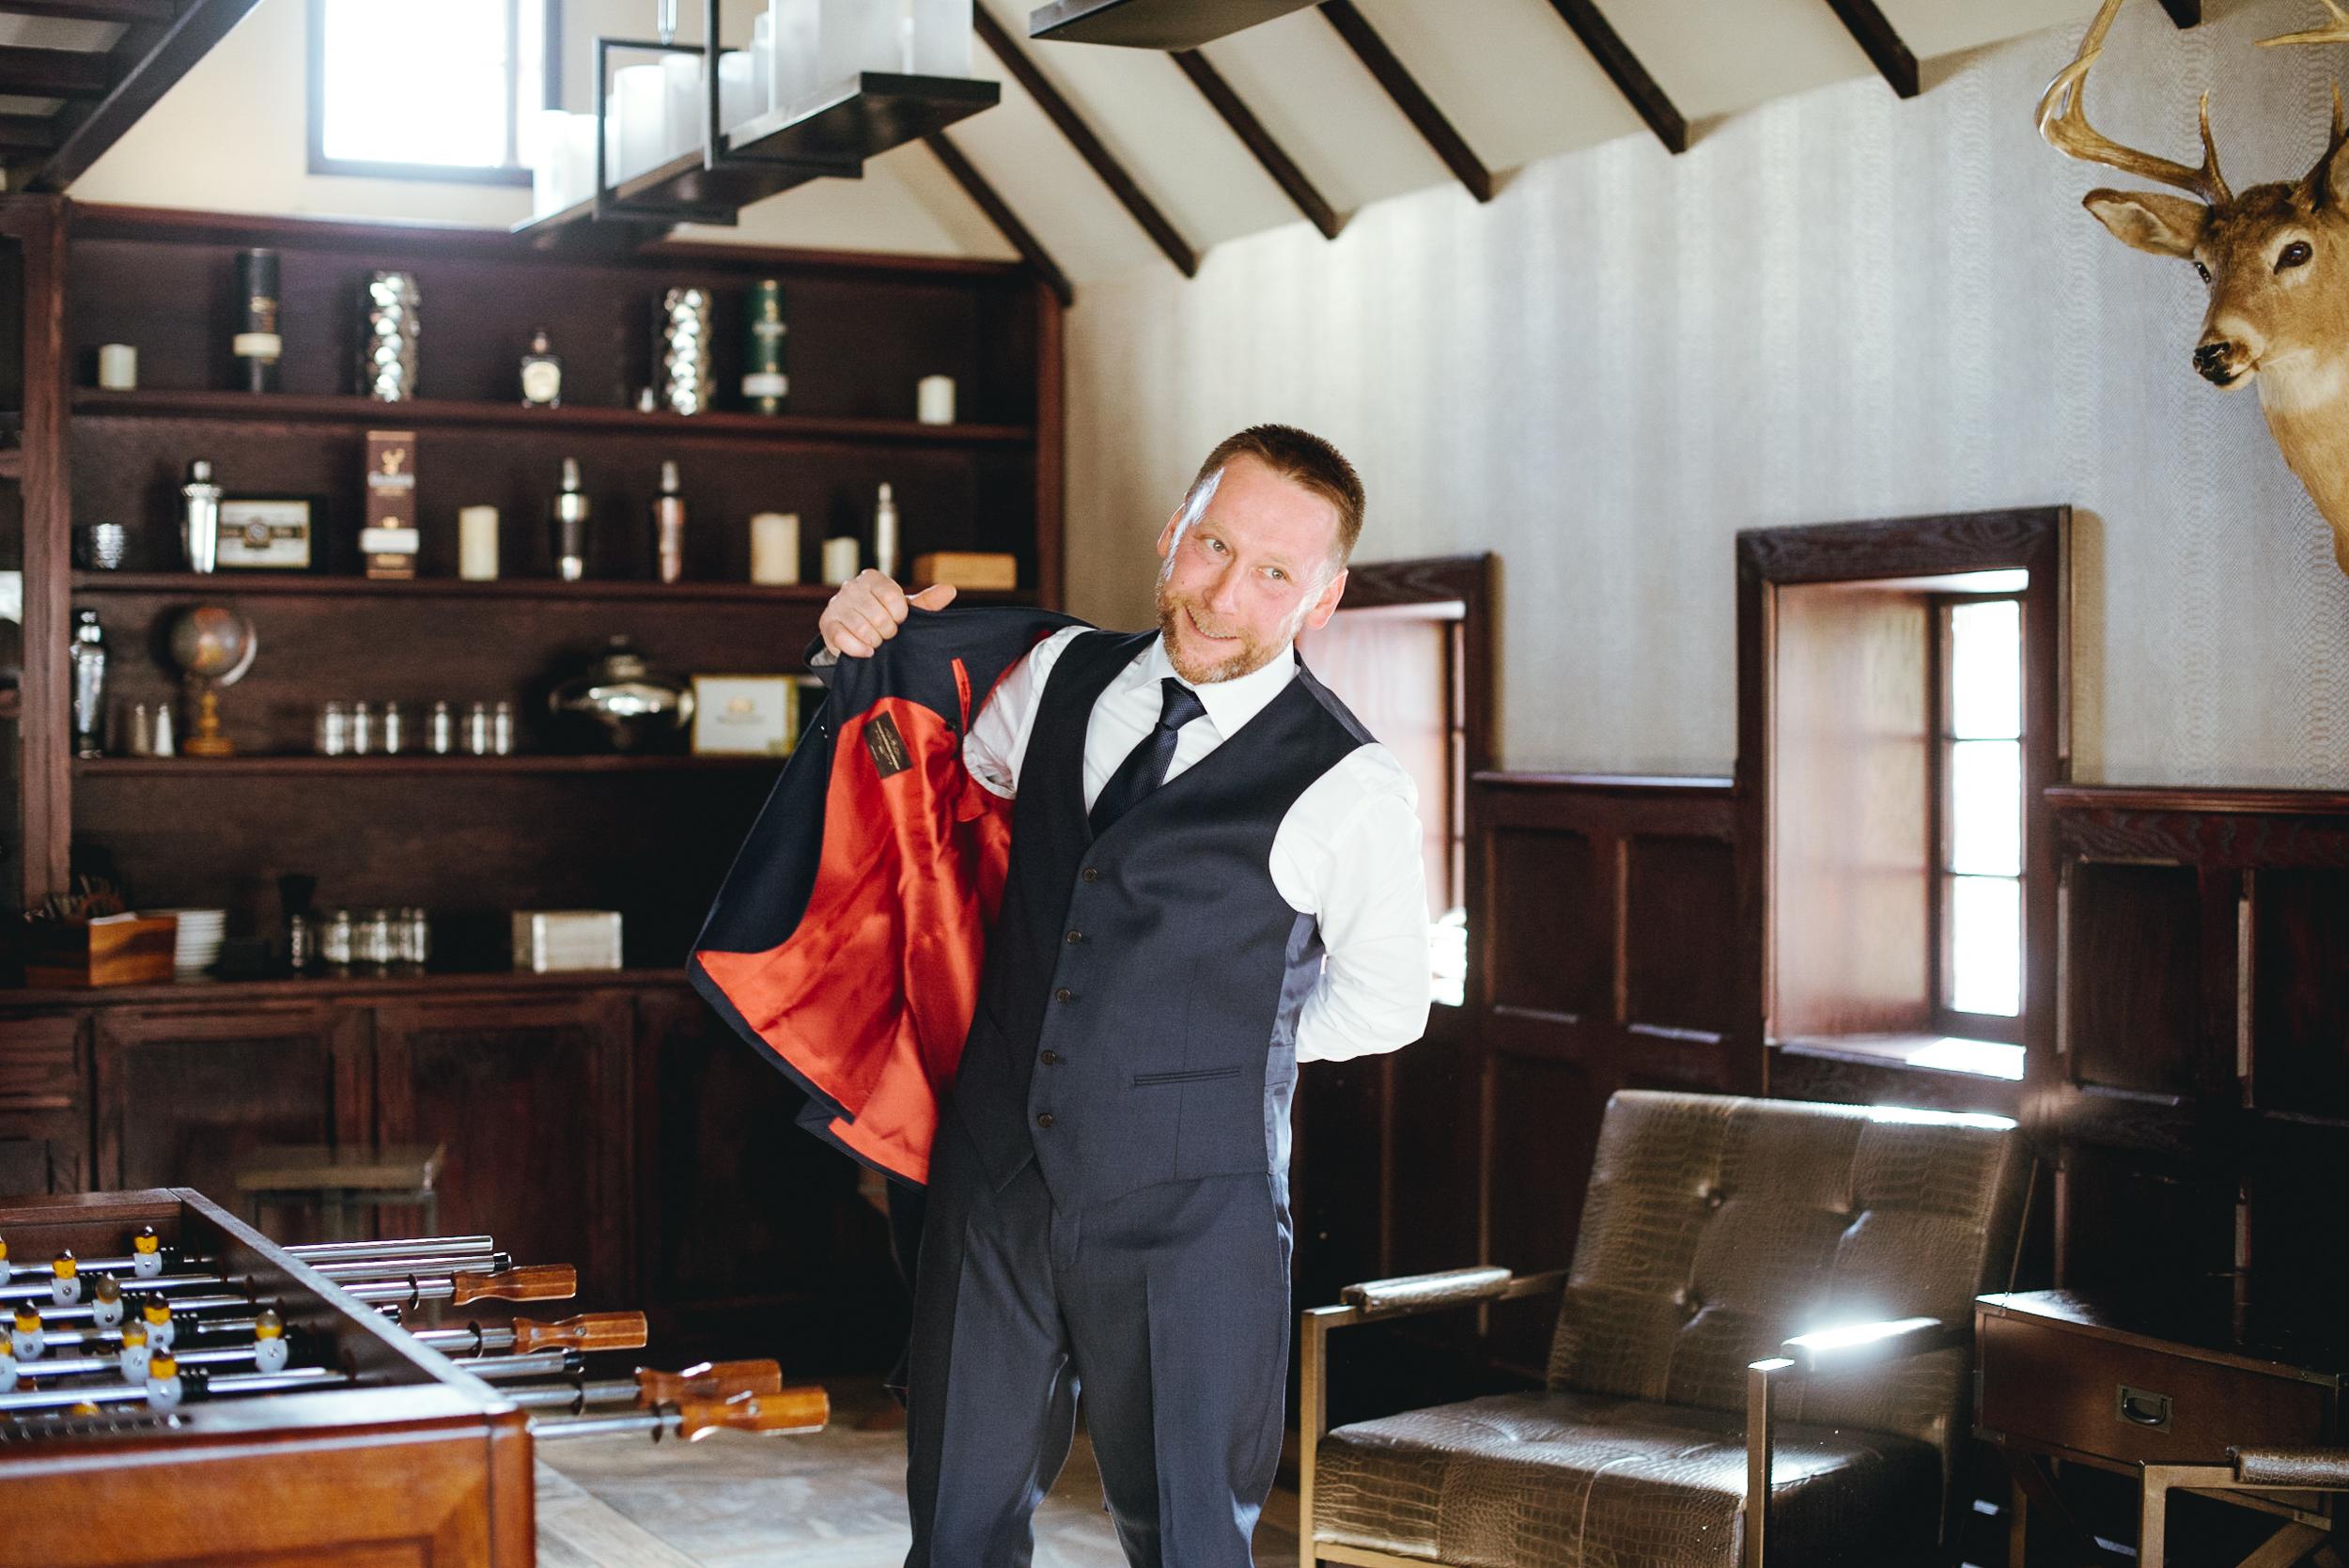 Hotel-du-village-wedding-winter-february-peaberry-photography-philadelphia-photographer-014.jpg